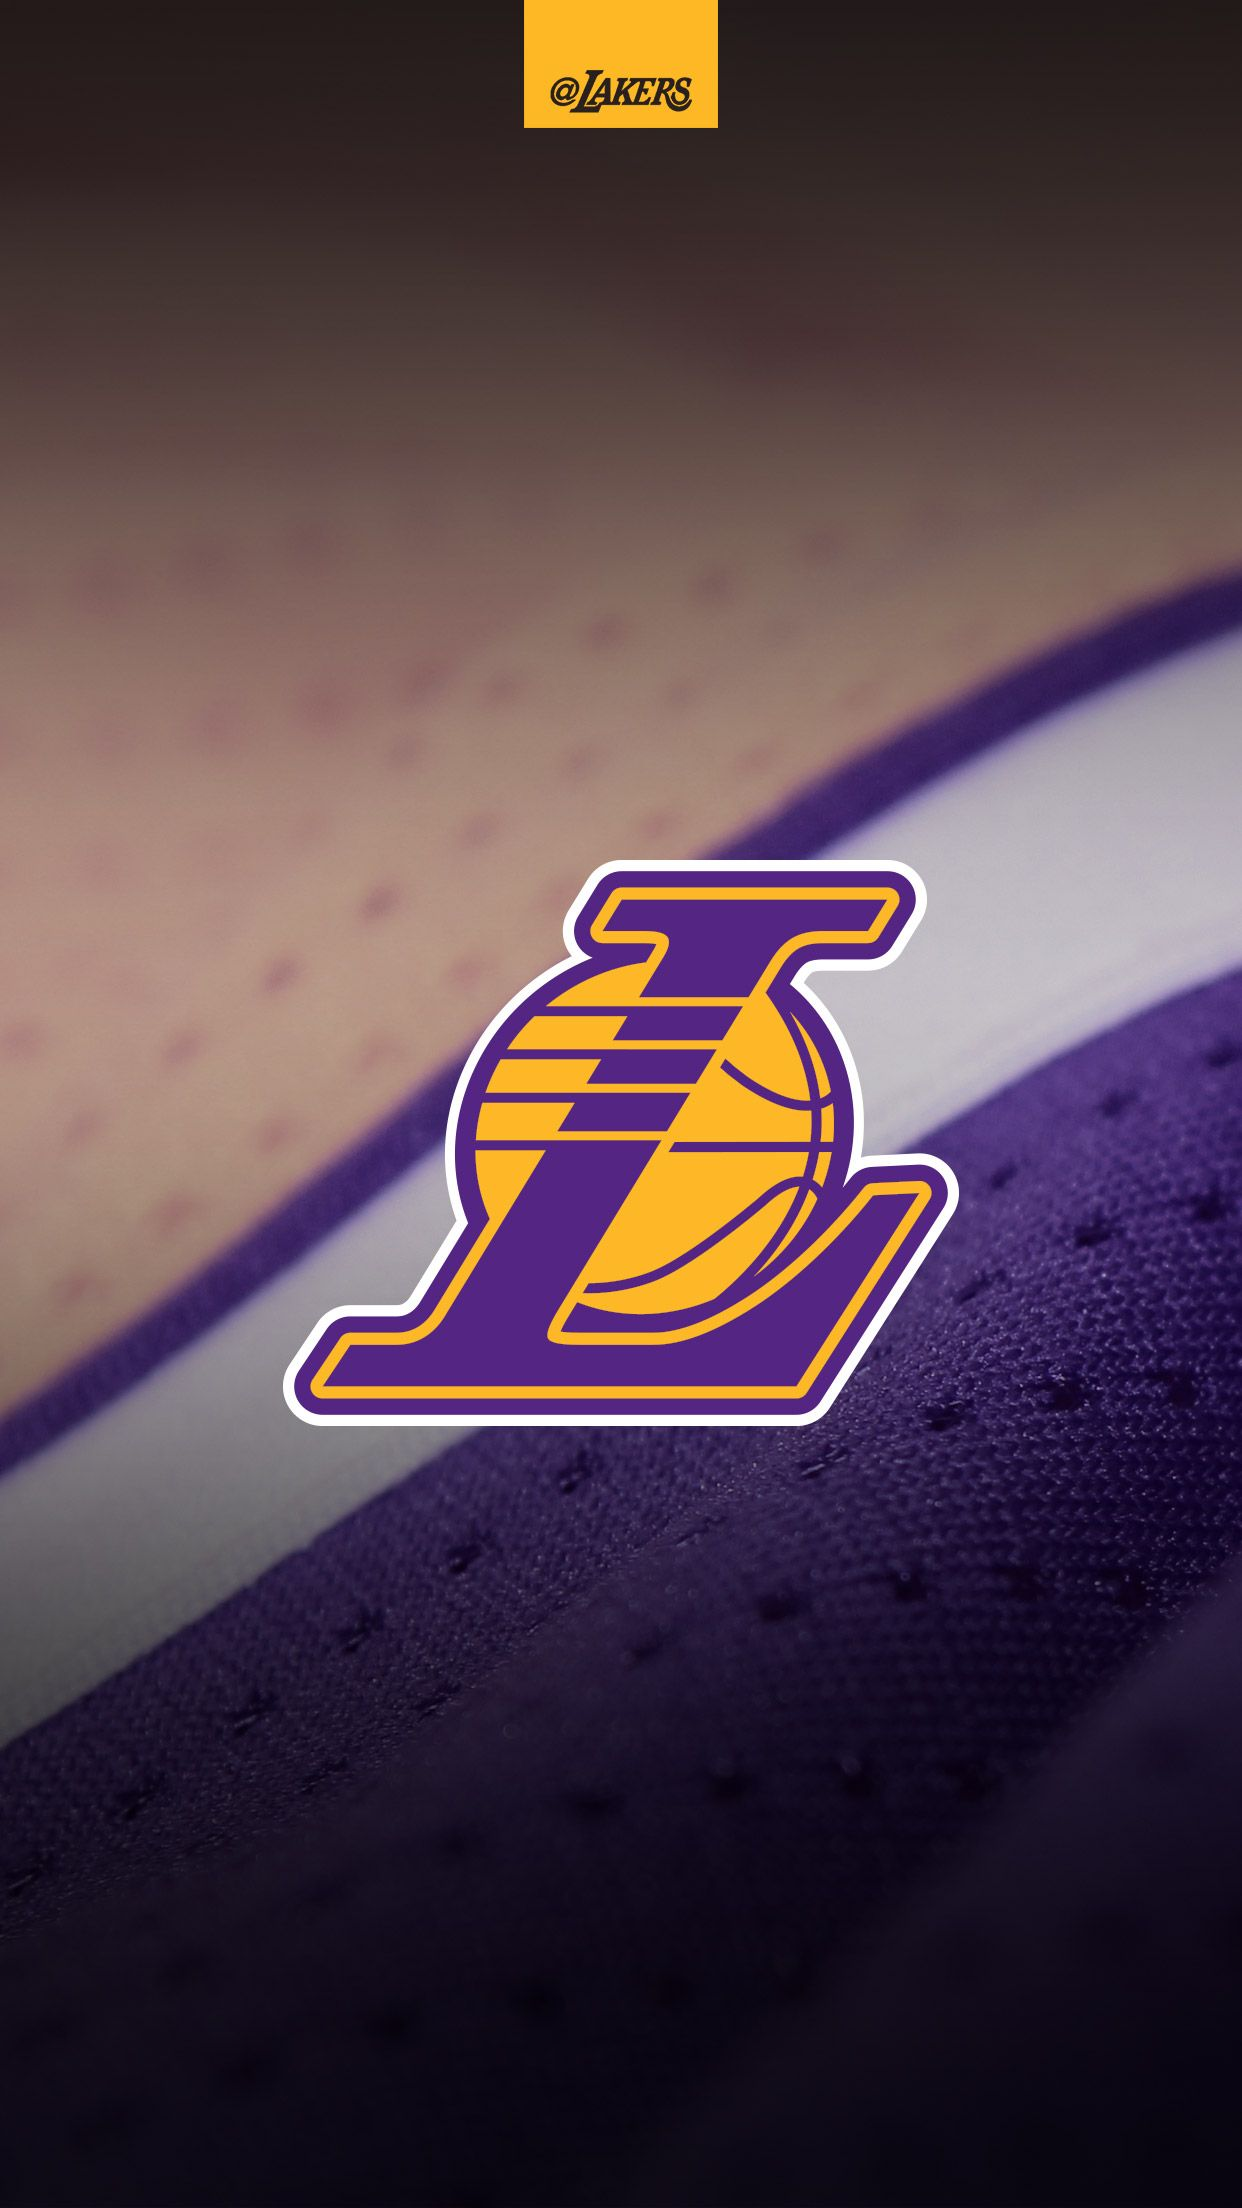 Lakers Wallpaper Iphone 6 Live Wallpaper Hd Lakers Wallpaper Basketball Iphone Wallpaper Lakers Logo